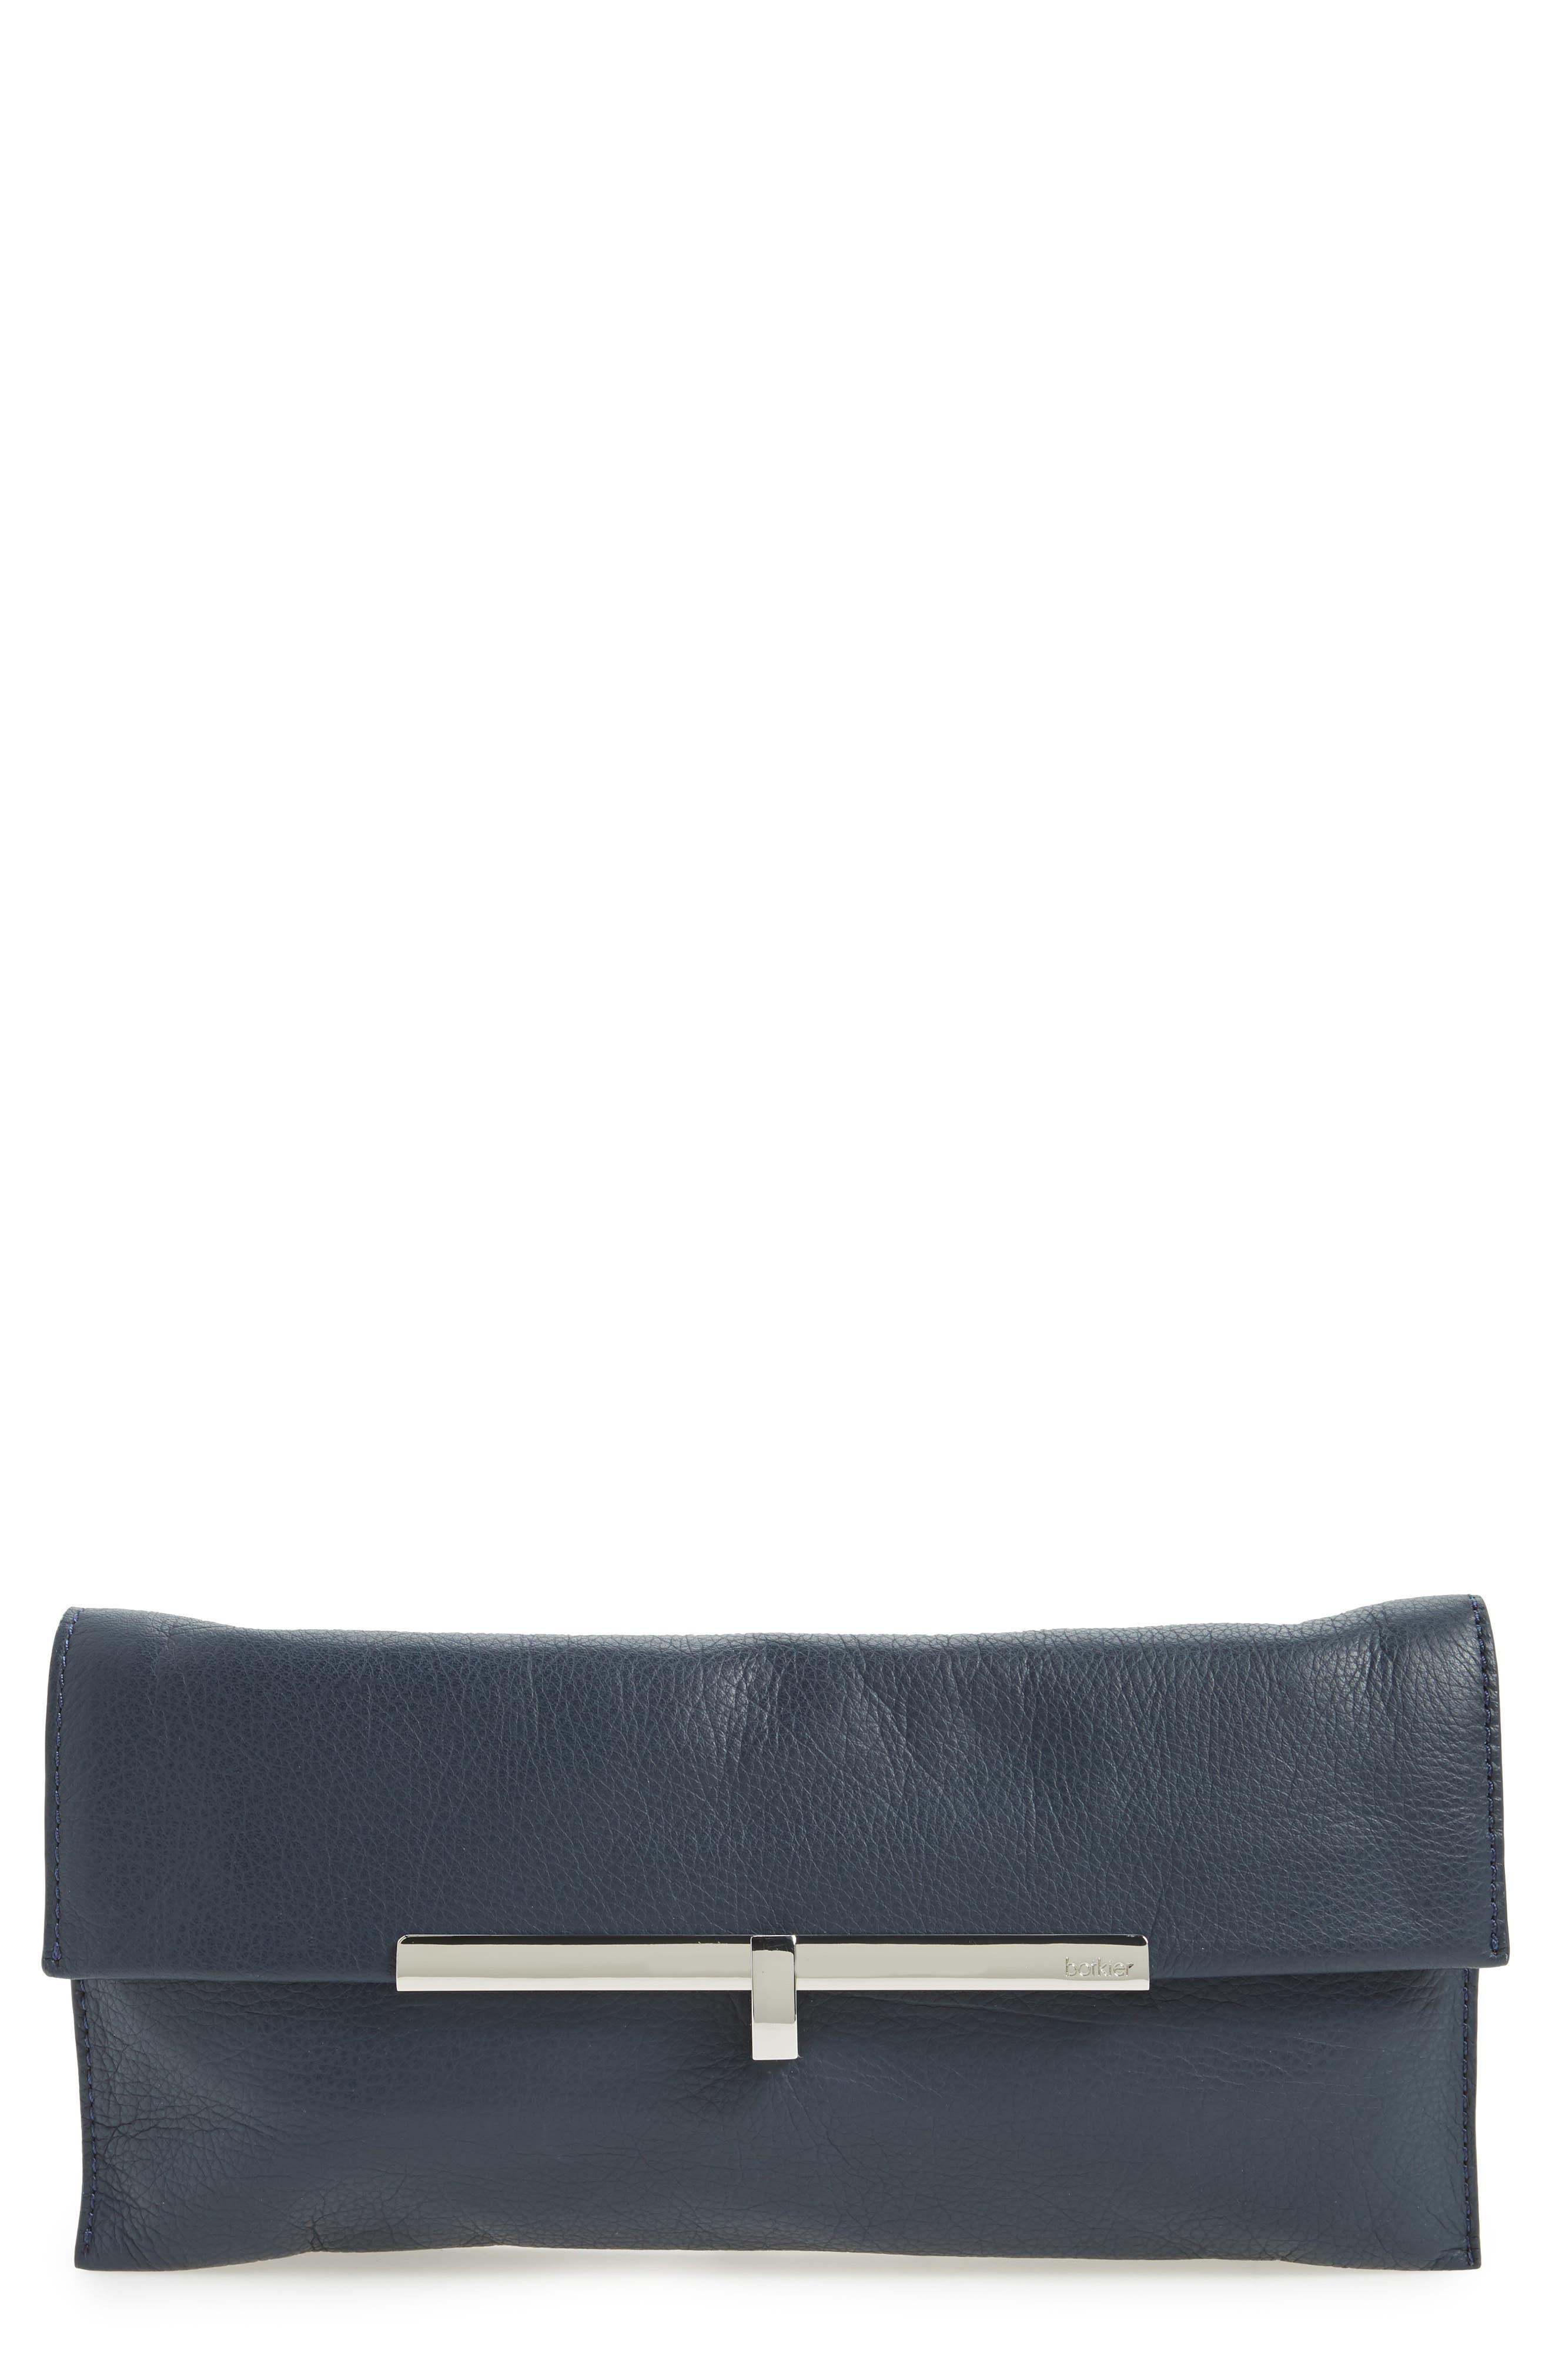 Bleeker Leather Clutch,                             Main thumbnail 1, color,                             Sapphire